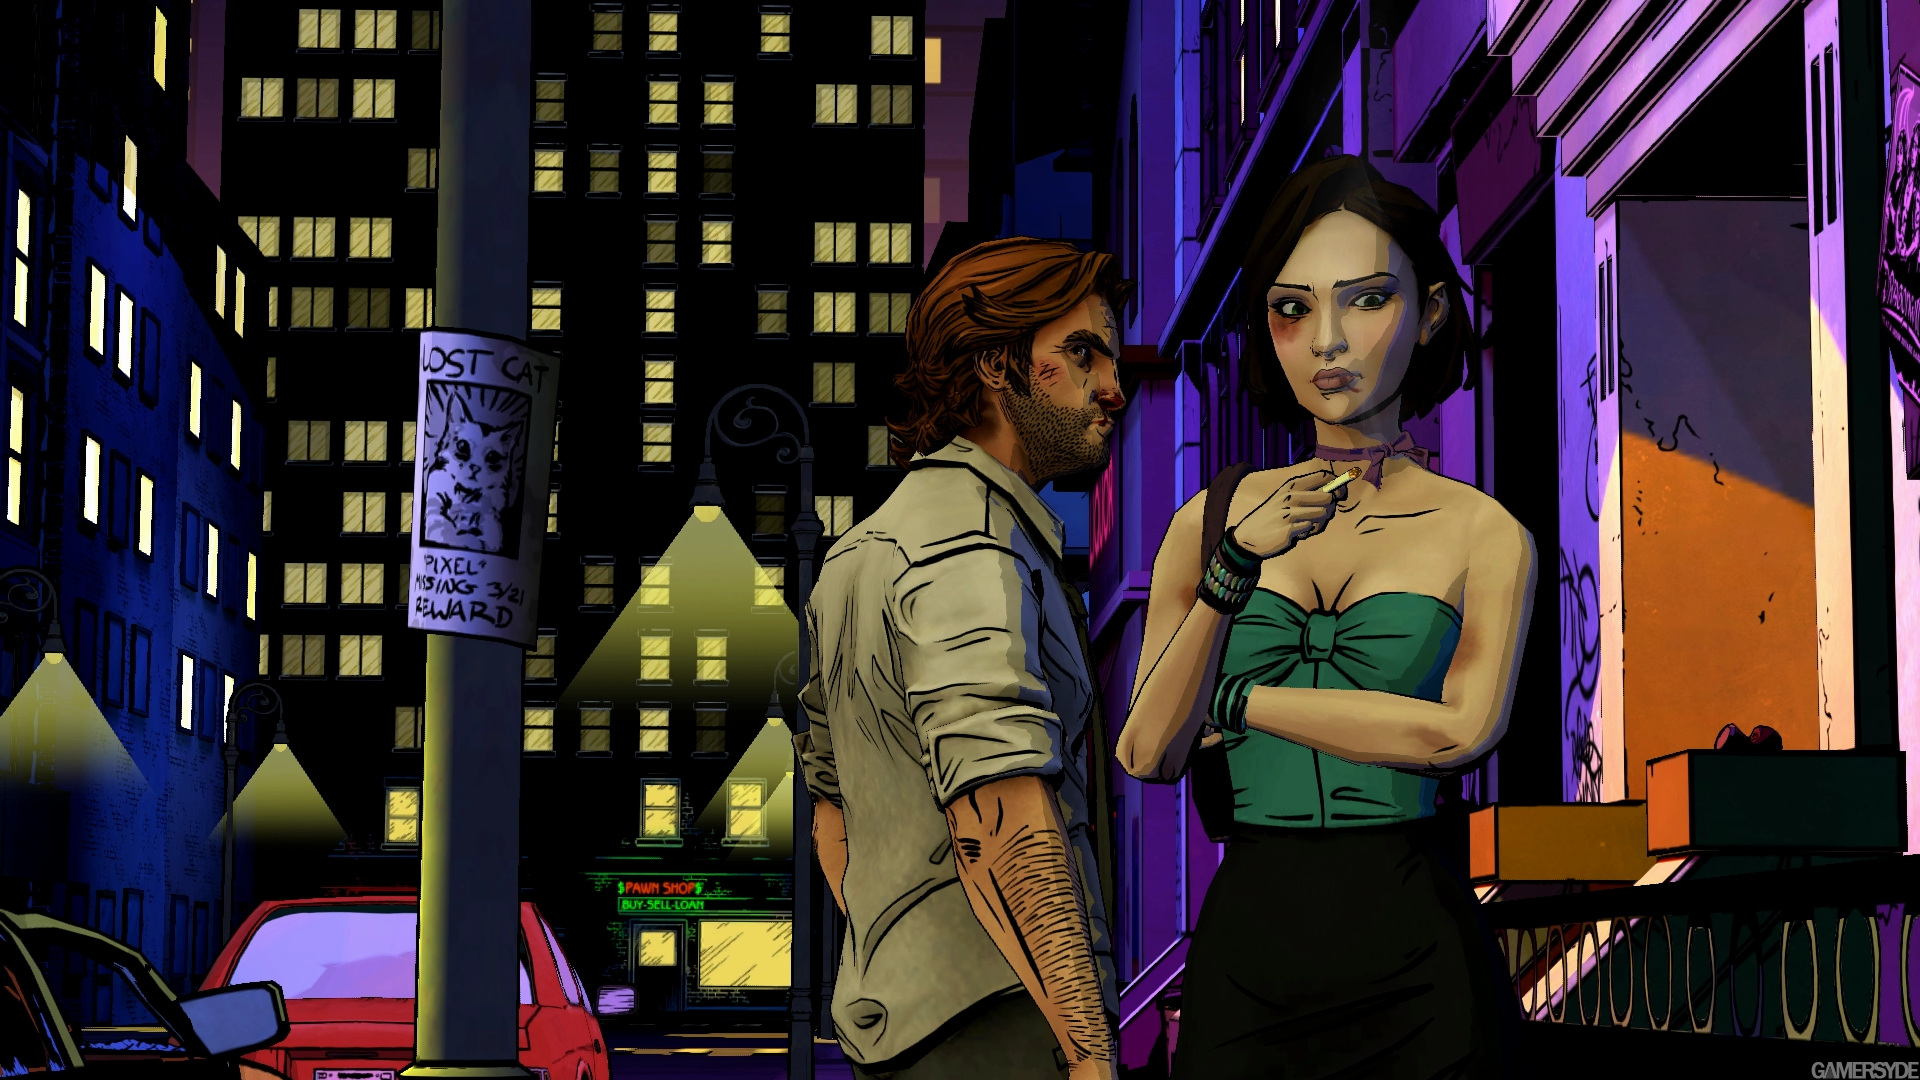 Image The Wolf Among Us 23455 2690 - Wolf Among Us Art Style , HD Wallpaper & Backgrounds